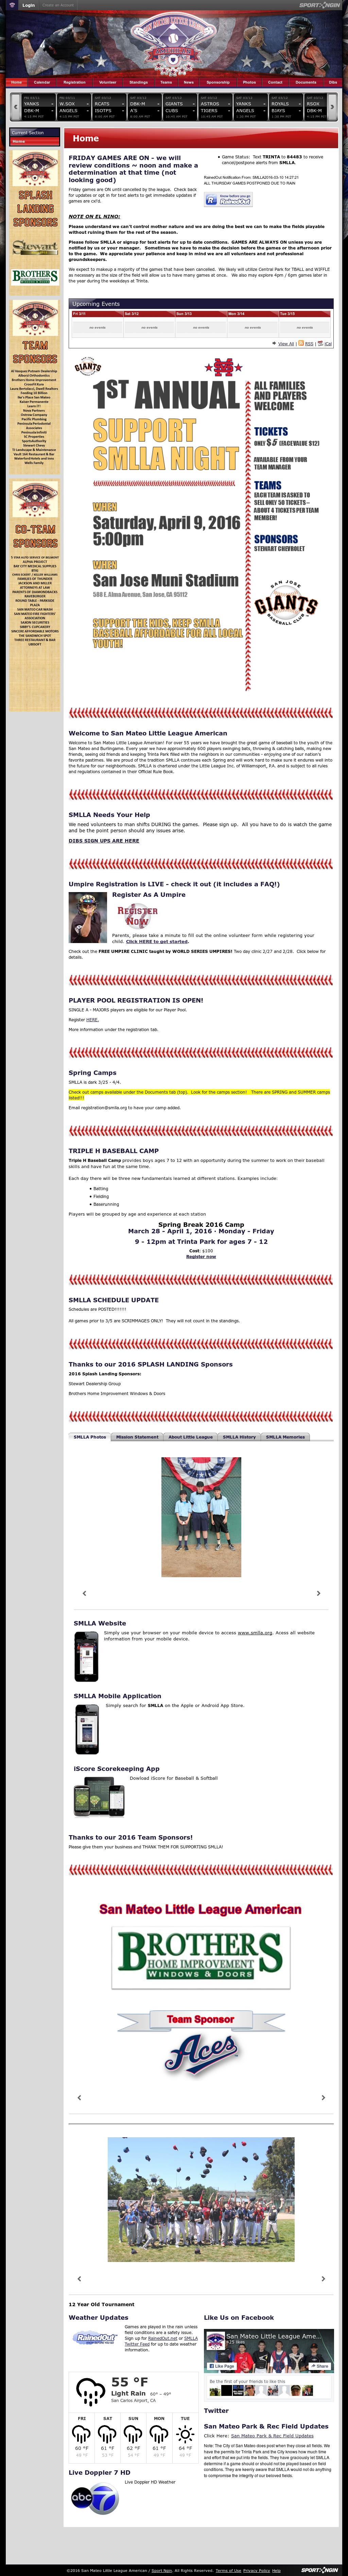 cf1b8a846a5c ... Employees Owler Company Profile. San Mateo Little League American Smlla Competitors  Revenue And